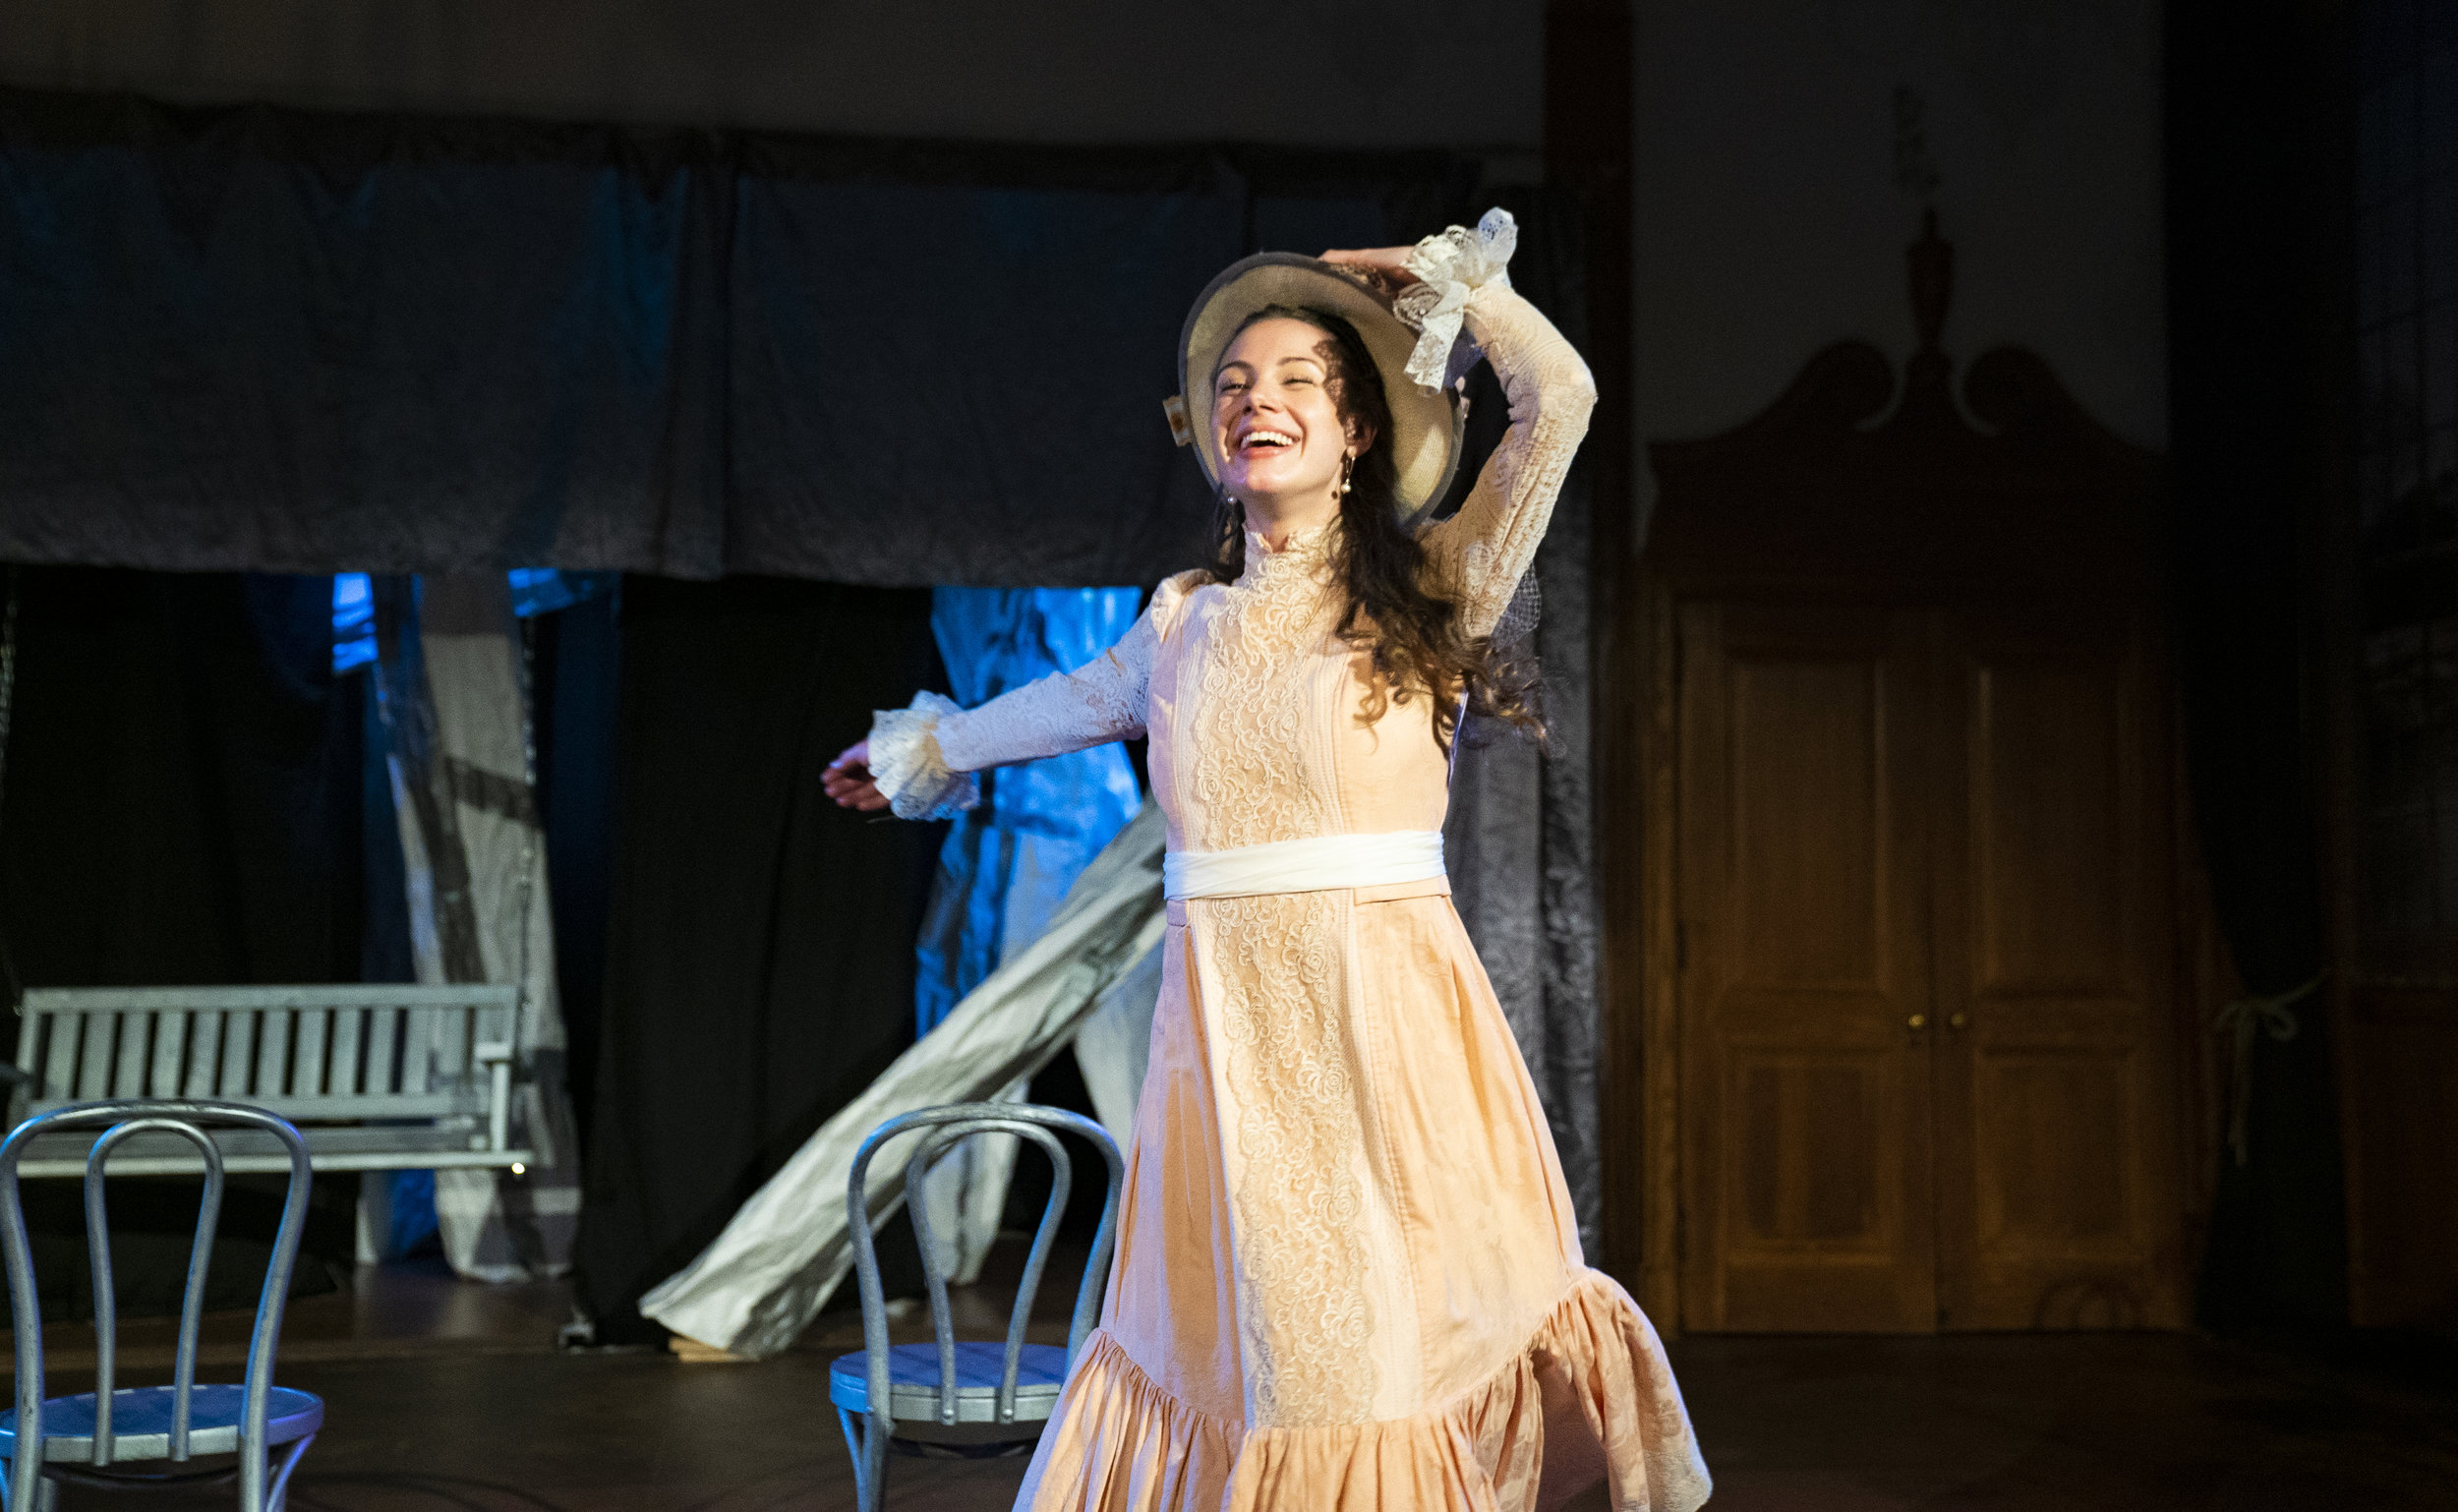 Luisa_Menzen_Theater.jpg